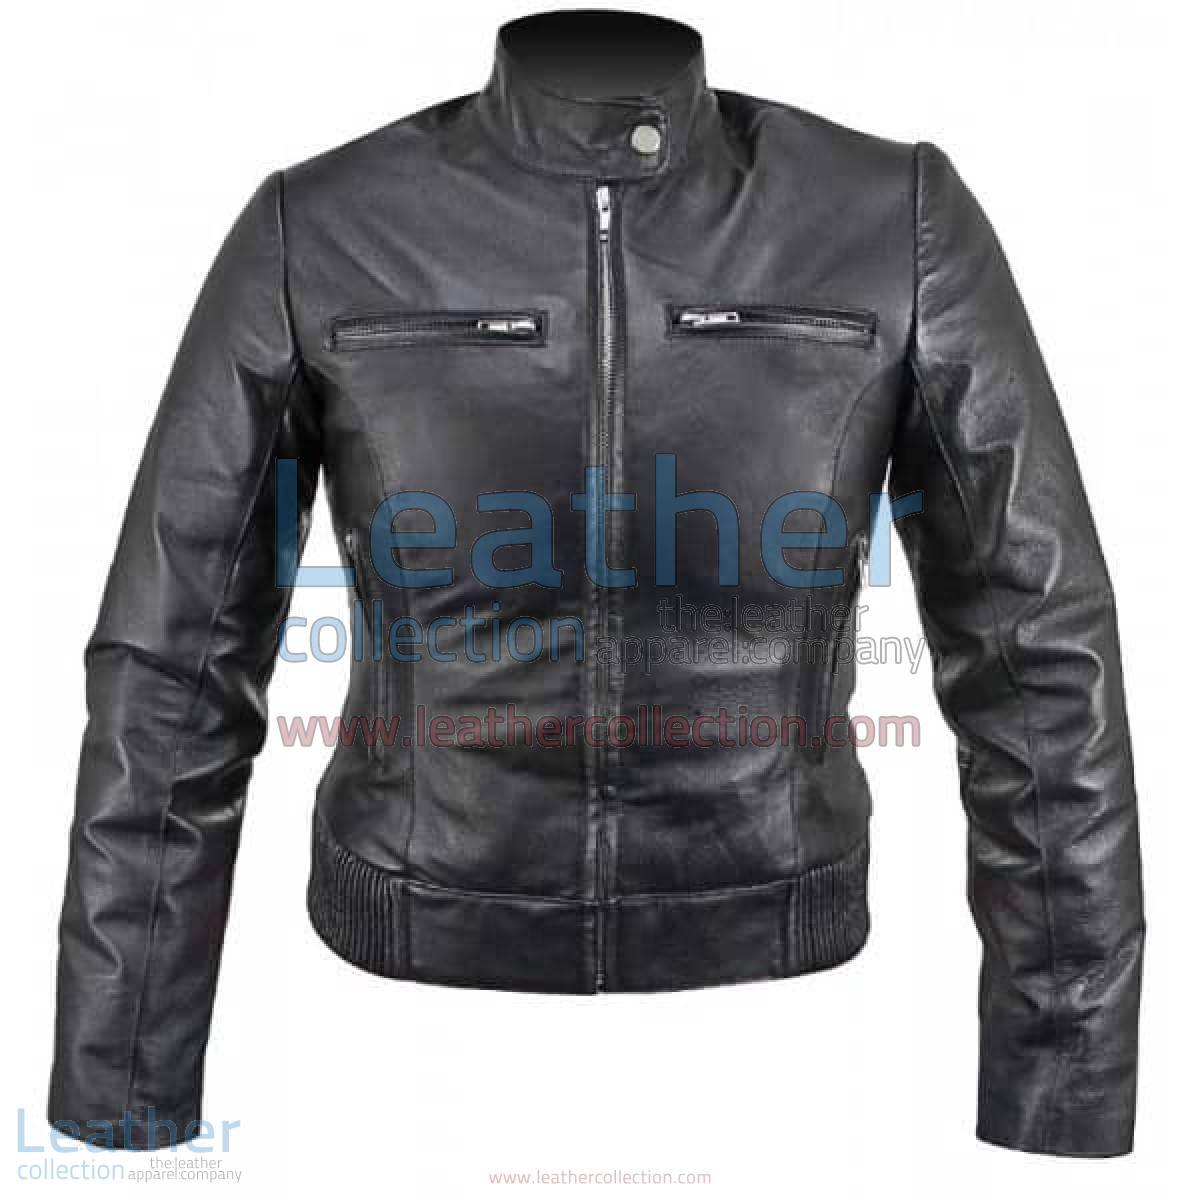 Ladies Waist Length Leather Jacket | waist length jacket